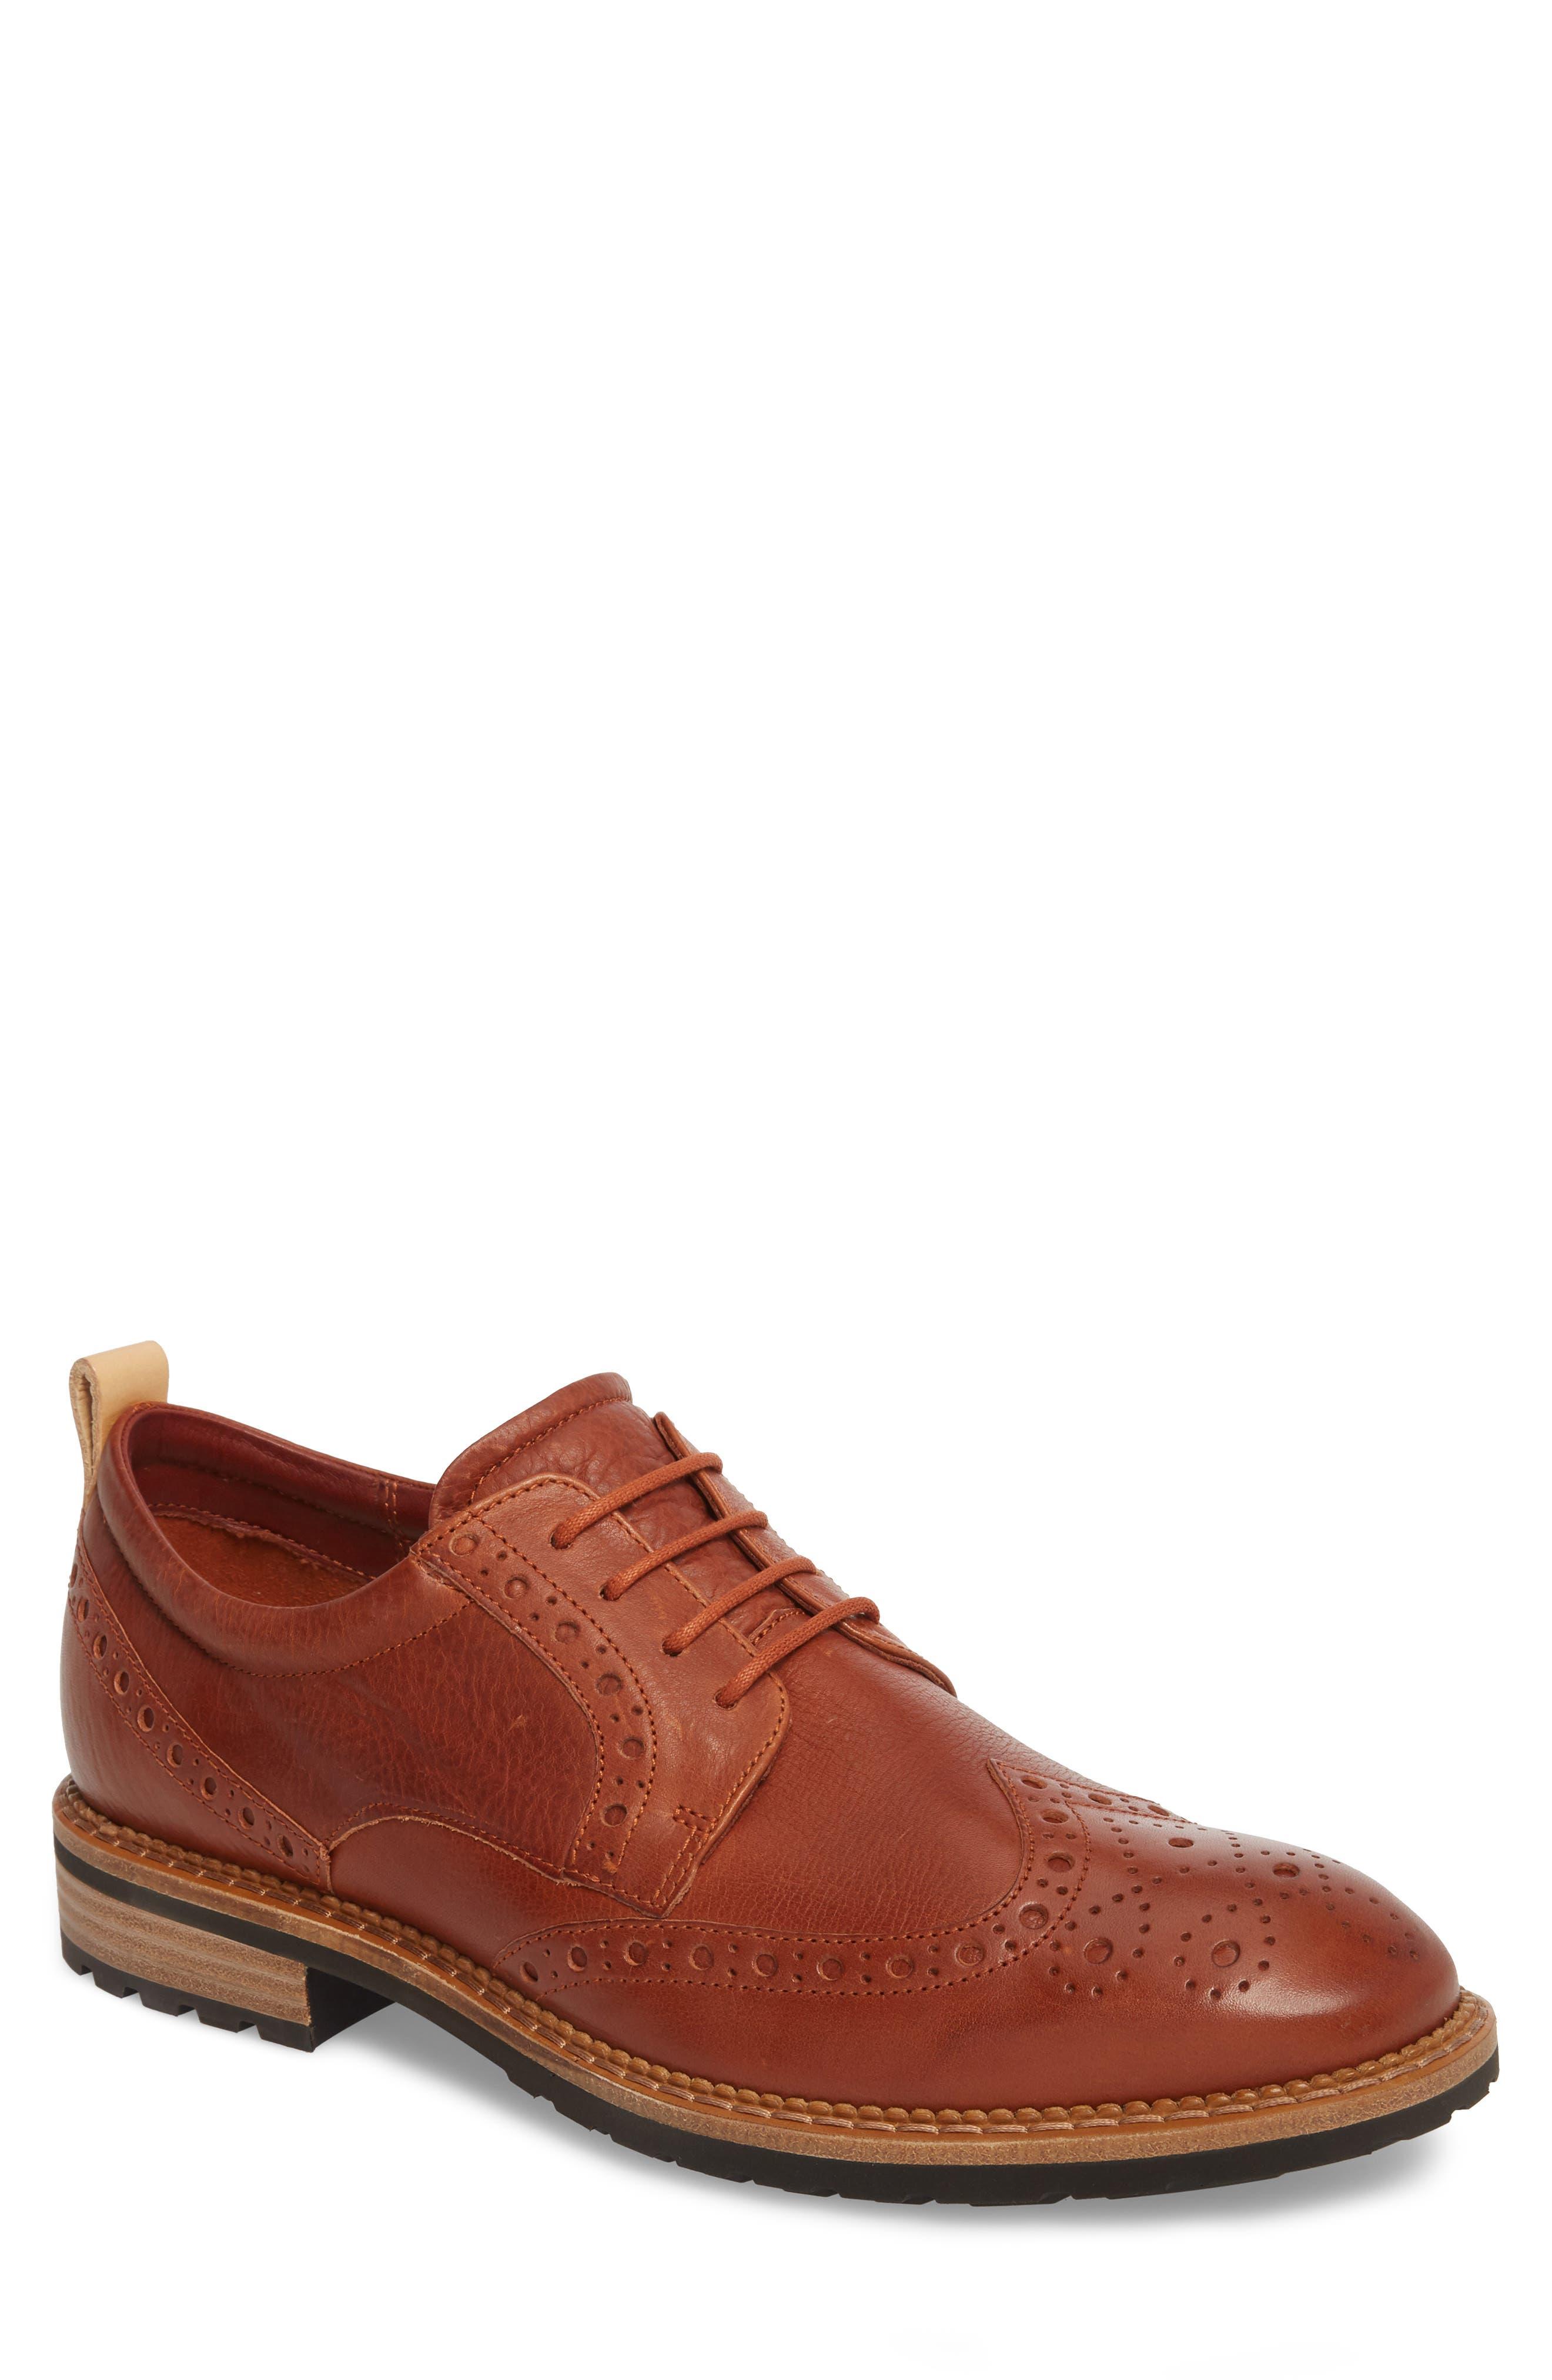 Vitrus I Wingtip,                         Main,                         color, Brandy Leather